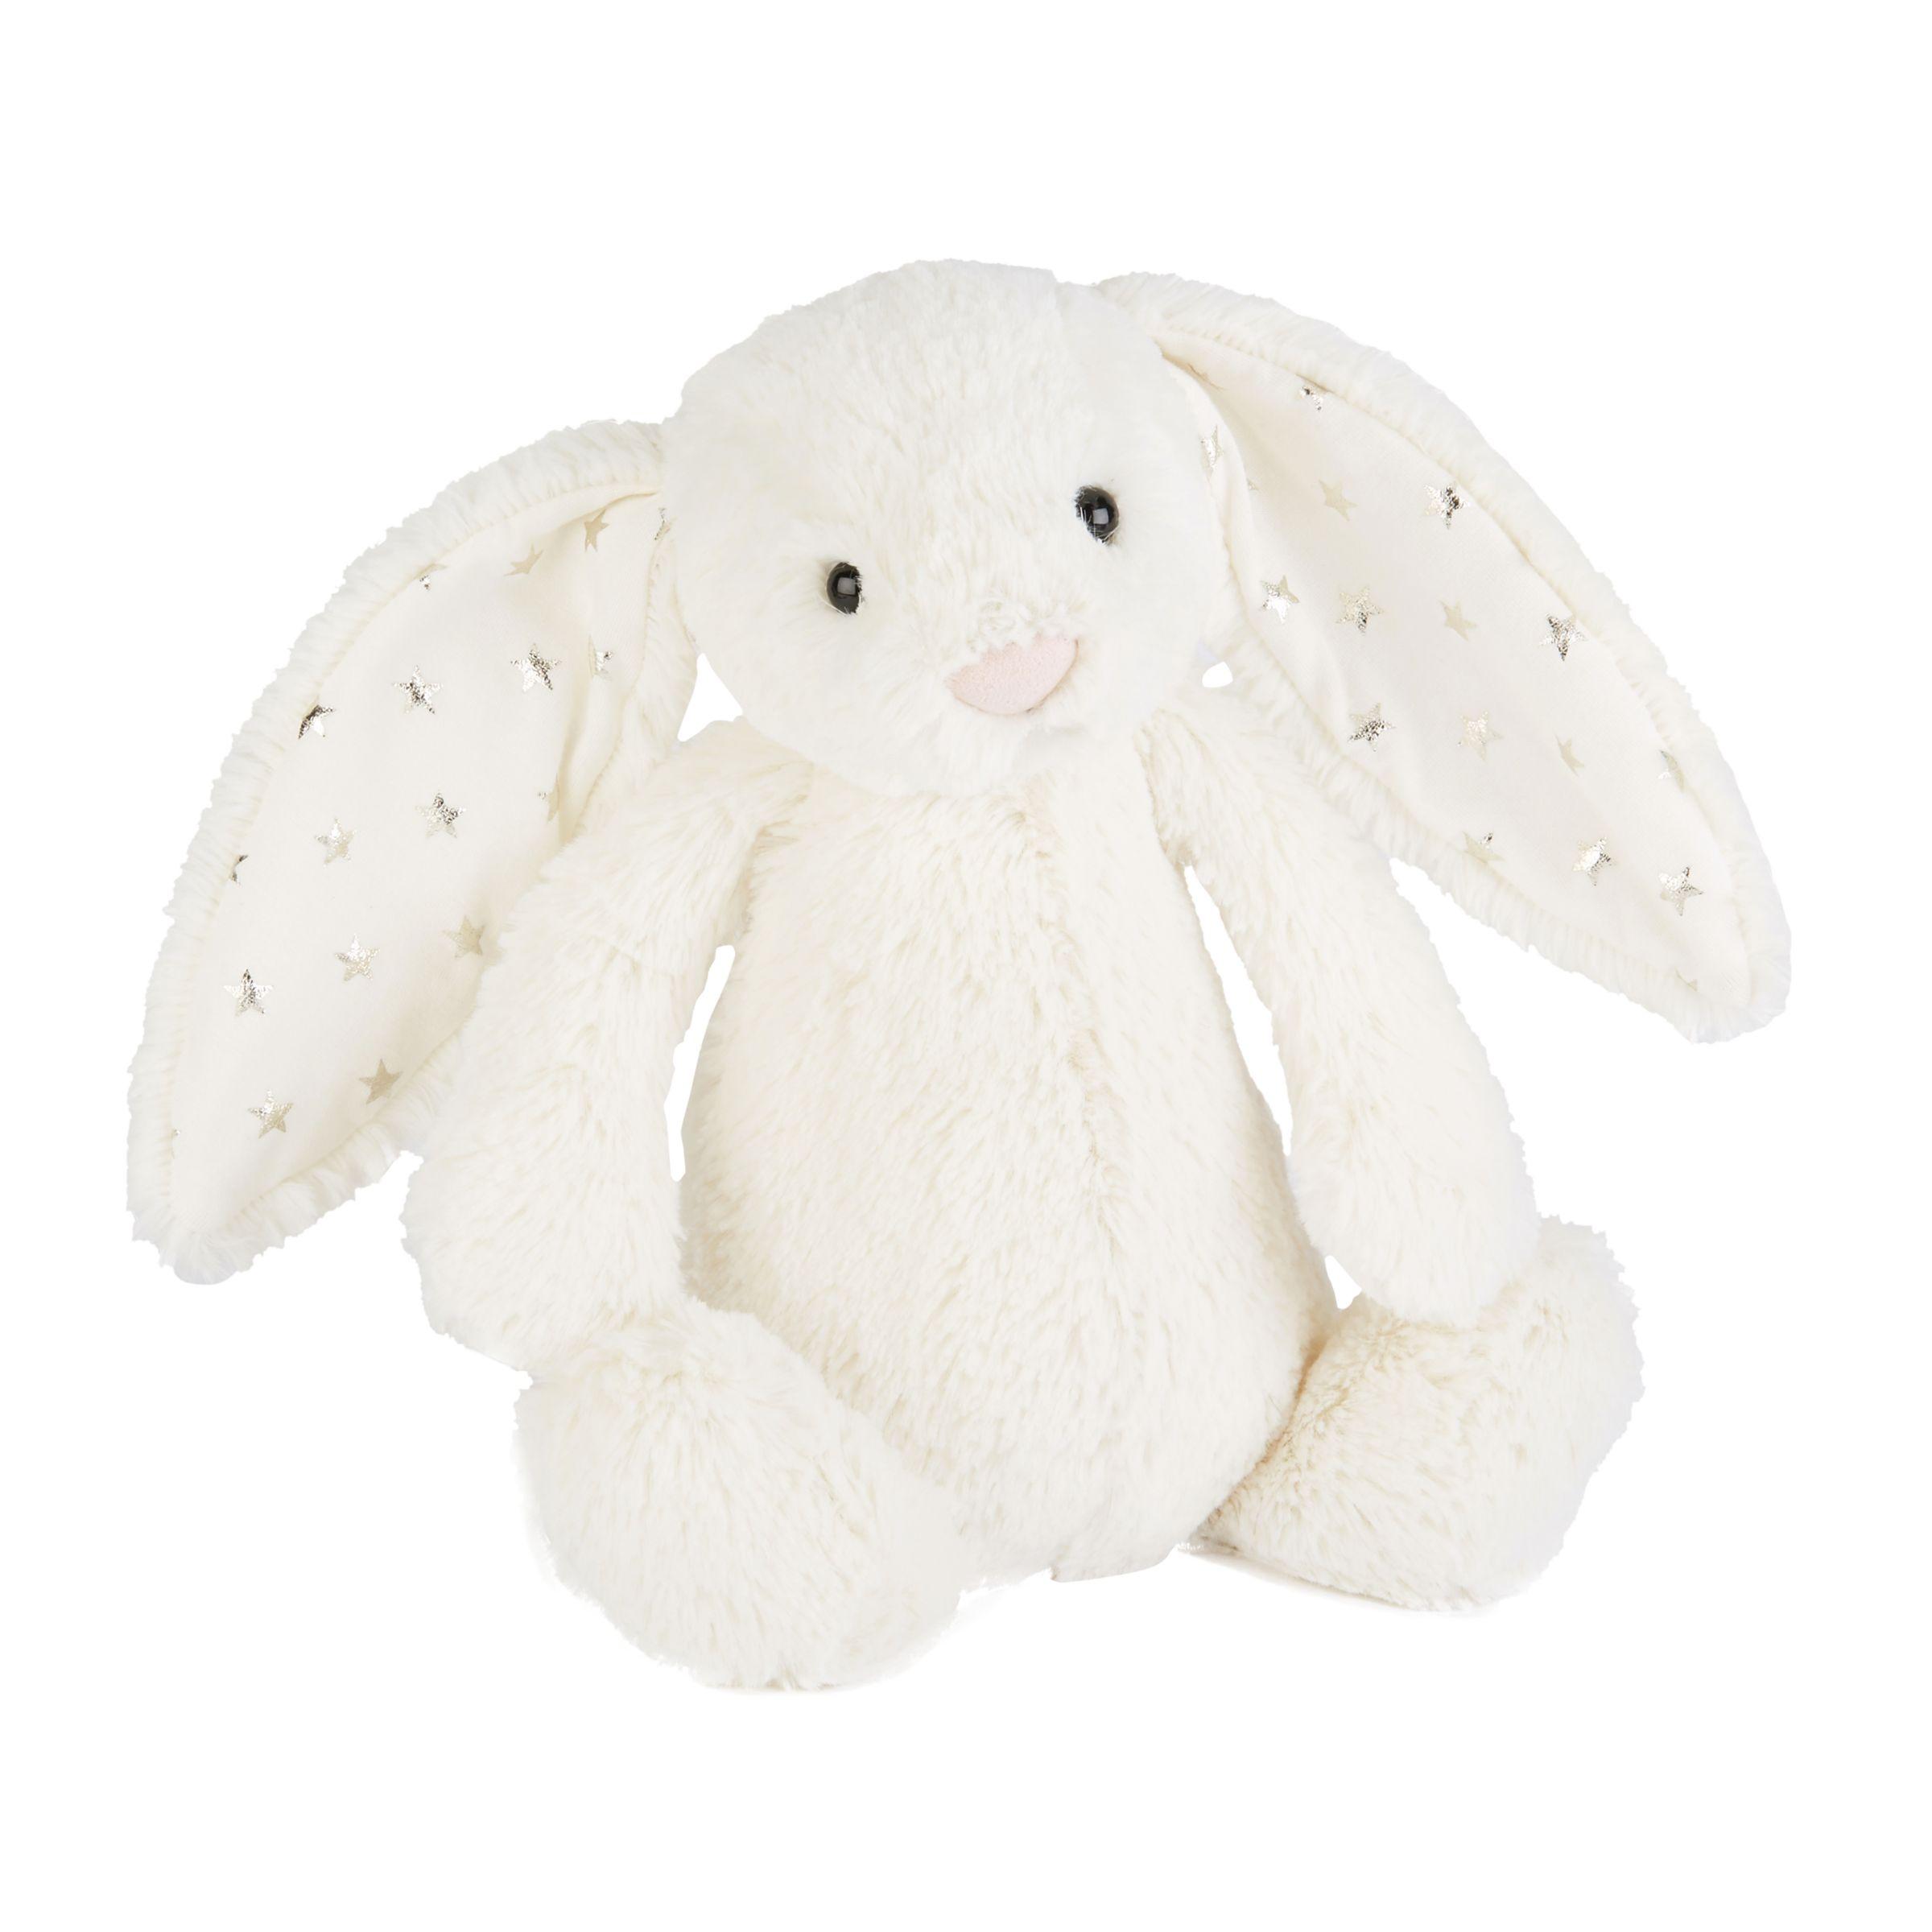 Jellycat Jellycat Bashful Twinkle Bunny Soft Toy, Small